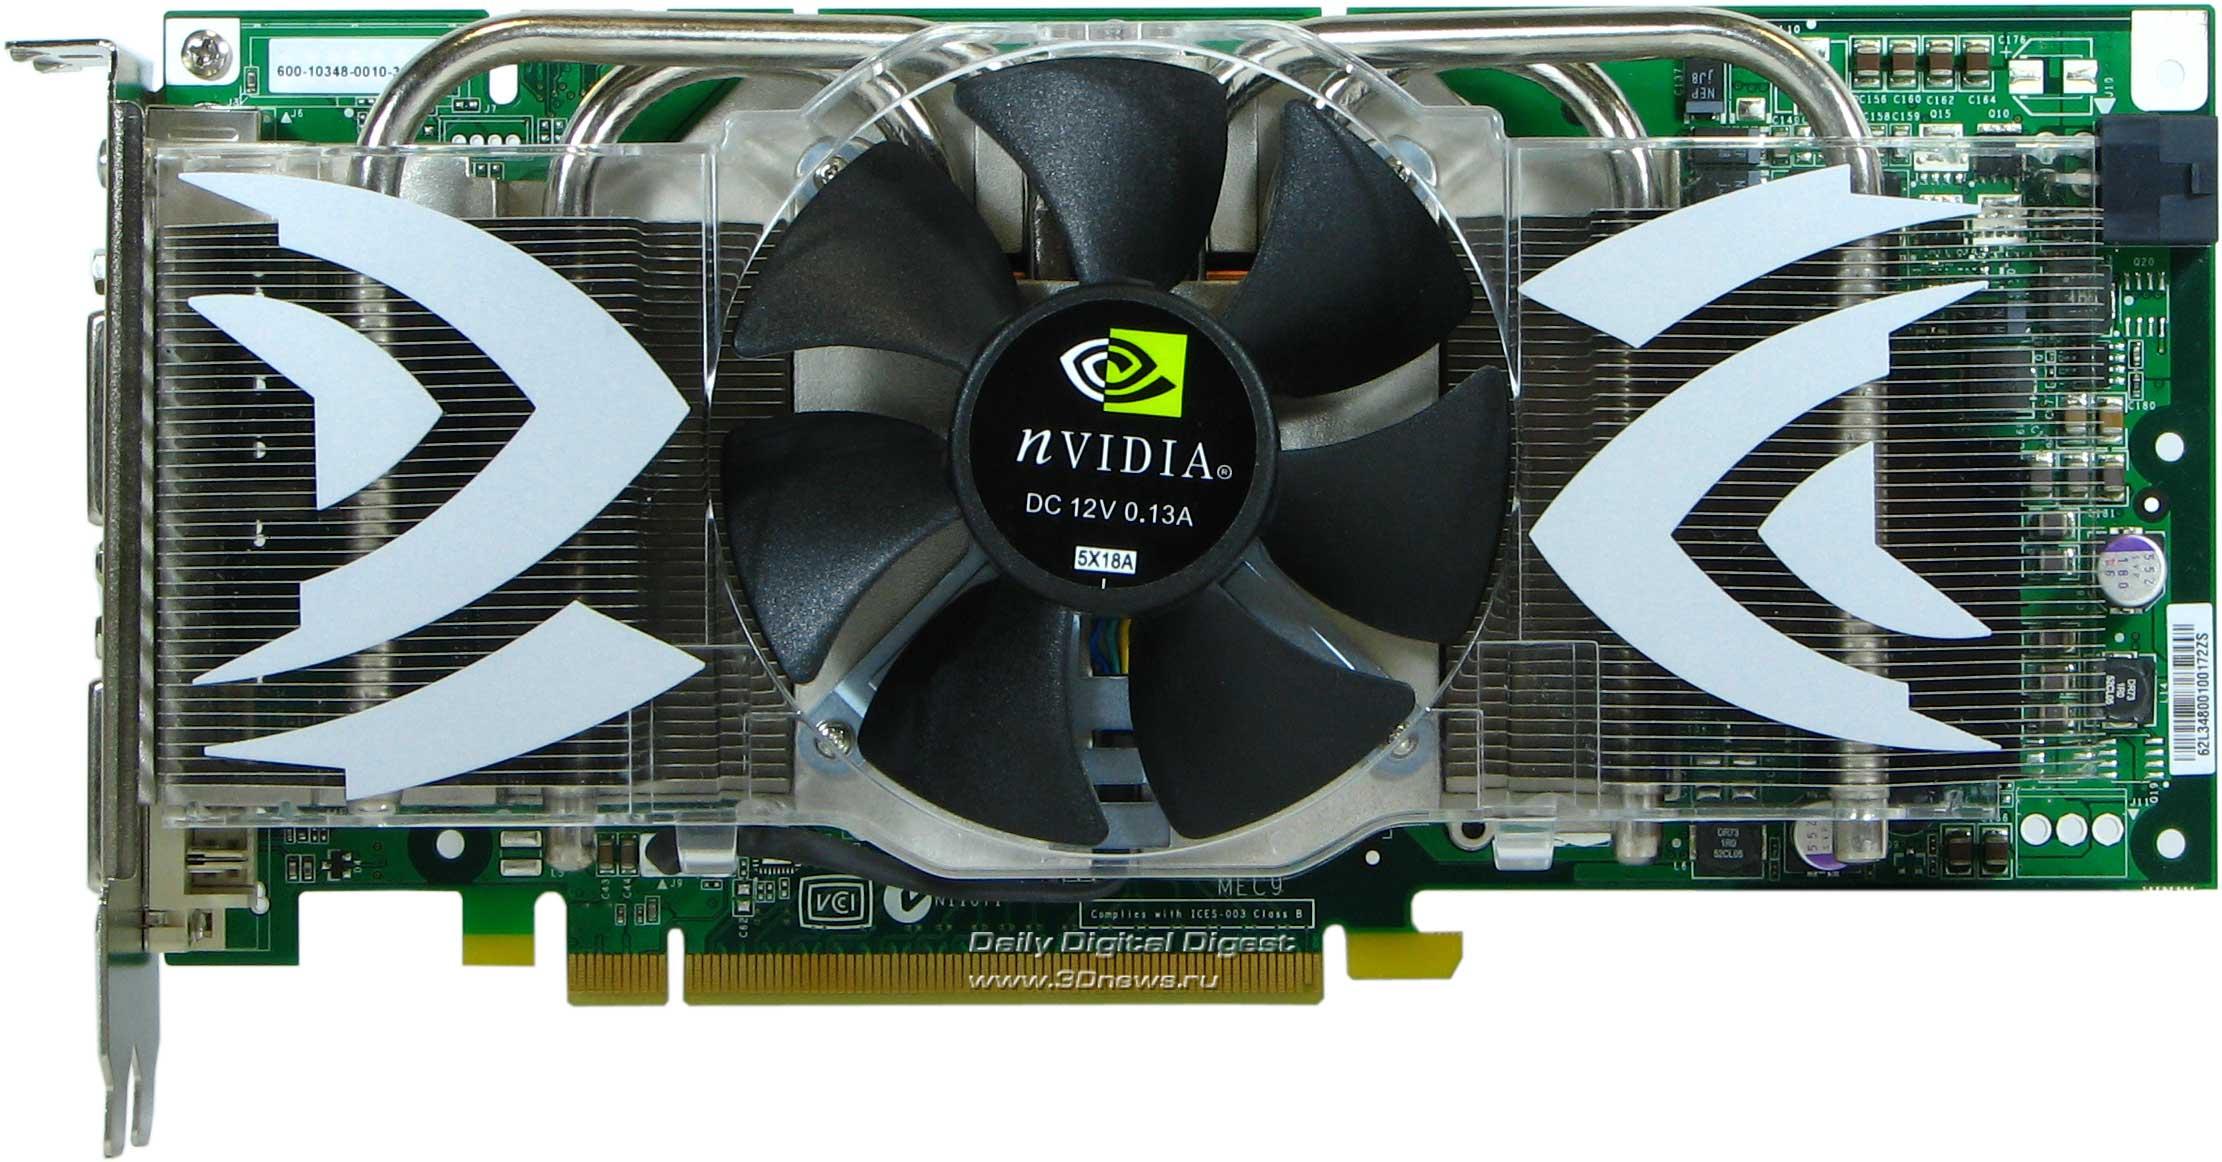 Новинки от NVIDIA - 7900GT и 7900GTX / Видеокарты / 3DNews - Daily ...